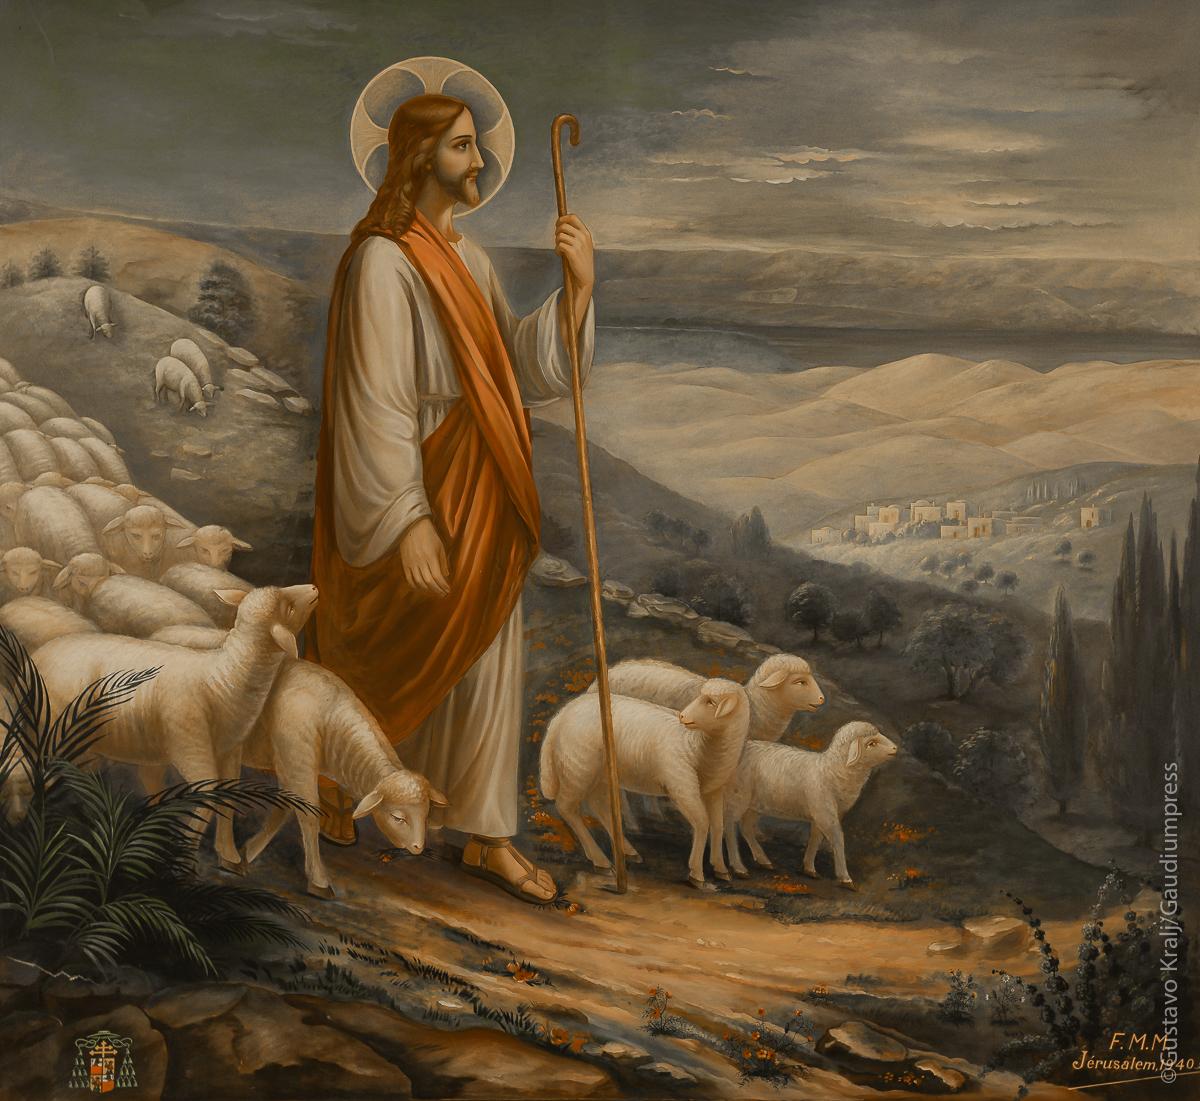 Jesus el Buen Pastor - Betania, Tierra Santa - Foto: Gustavo Kralj/GaudiumpressImages.com